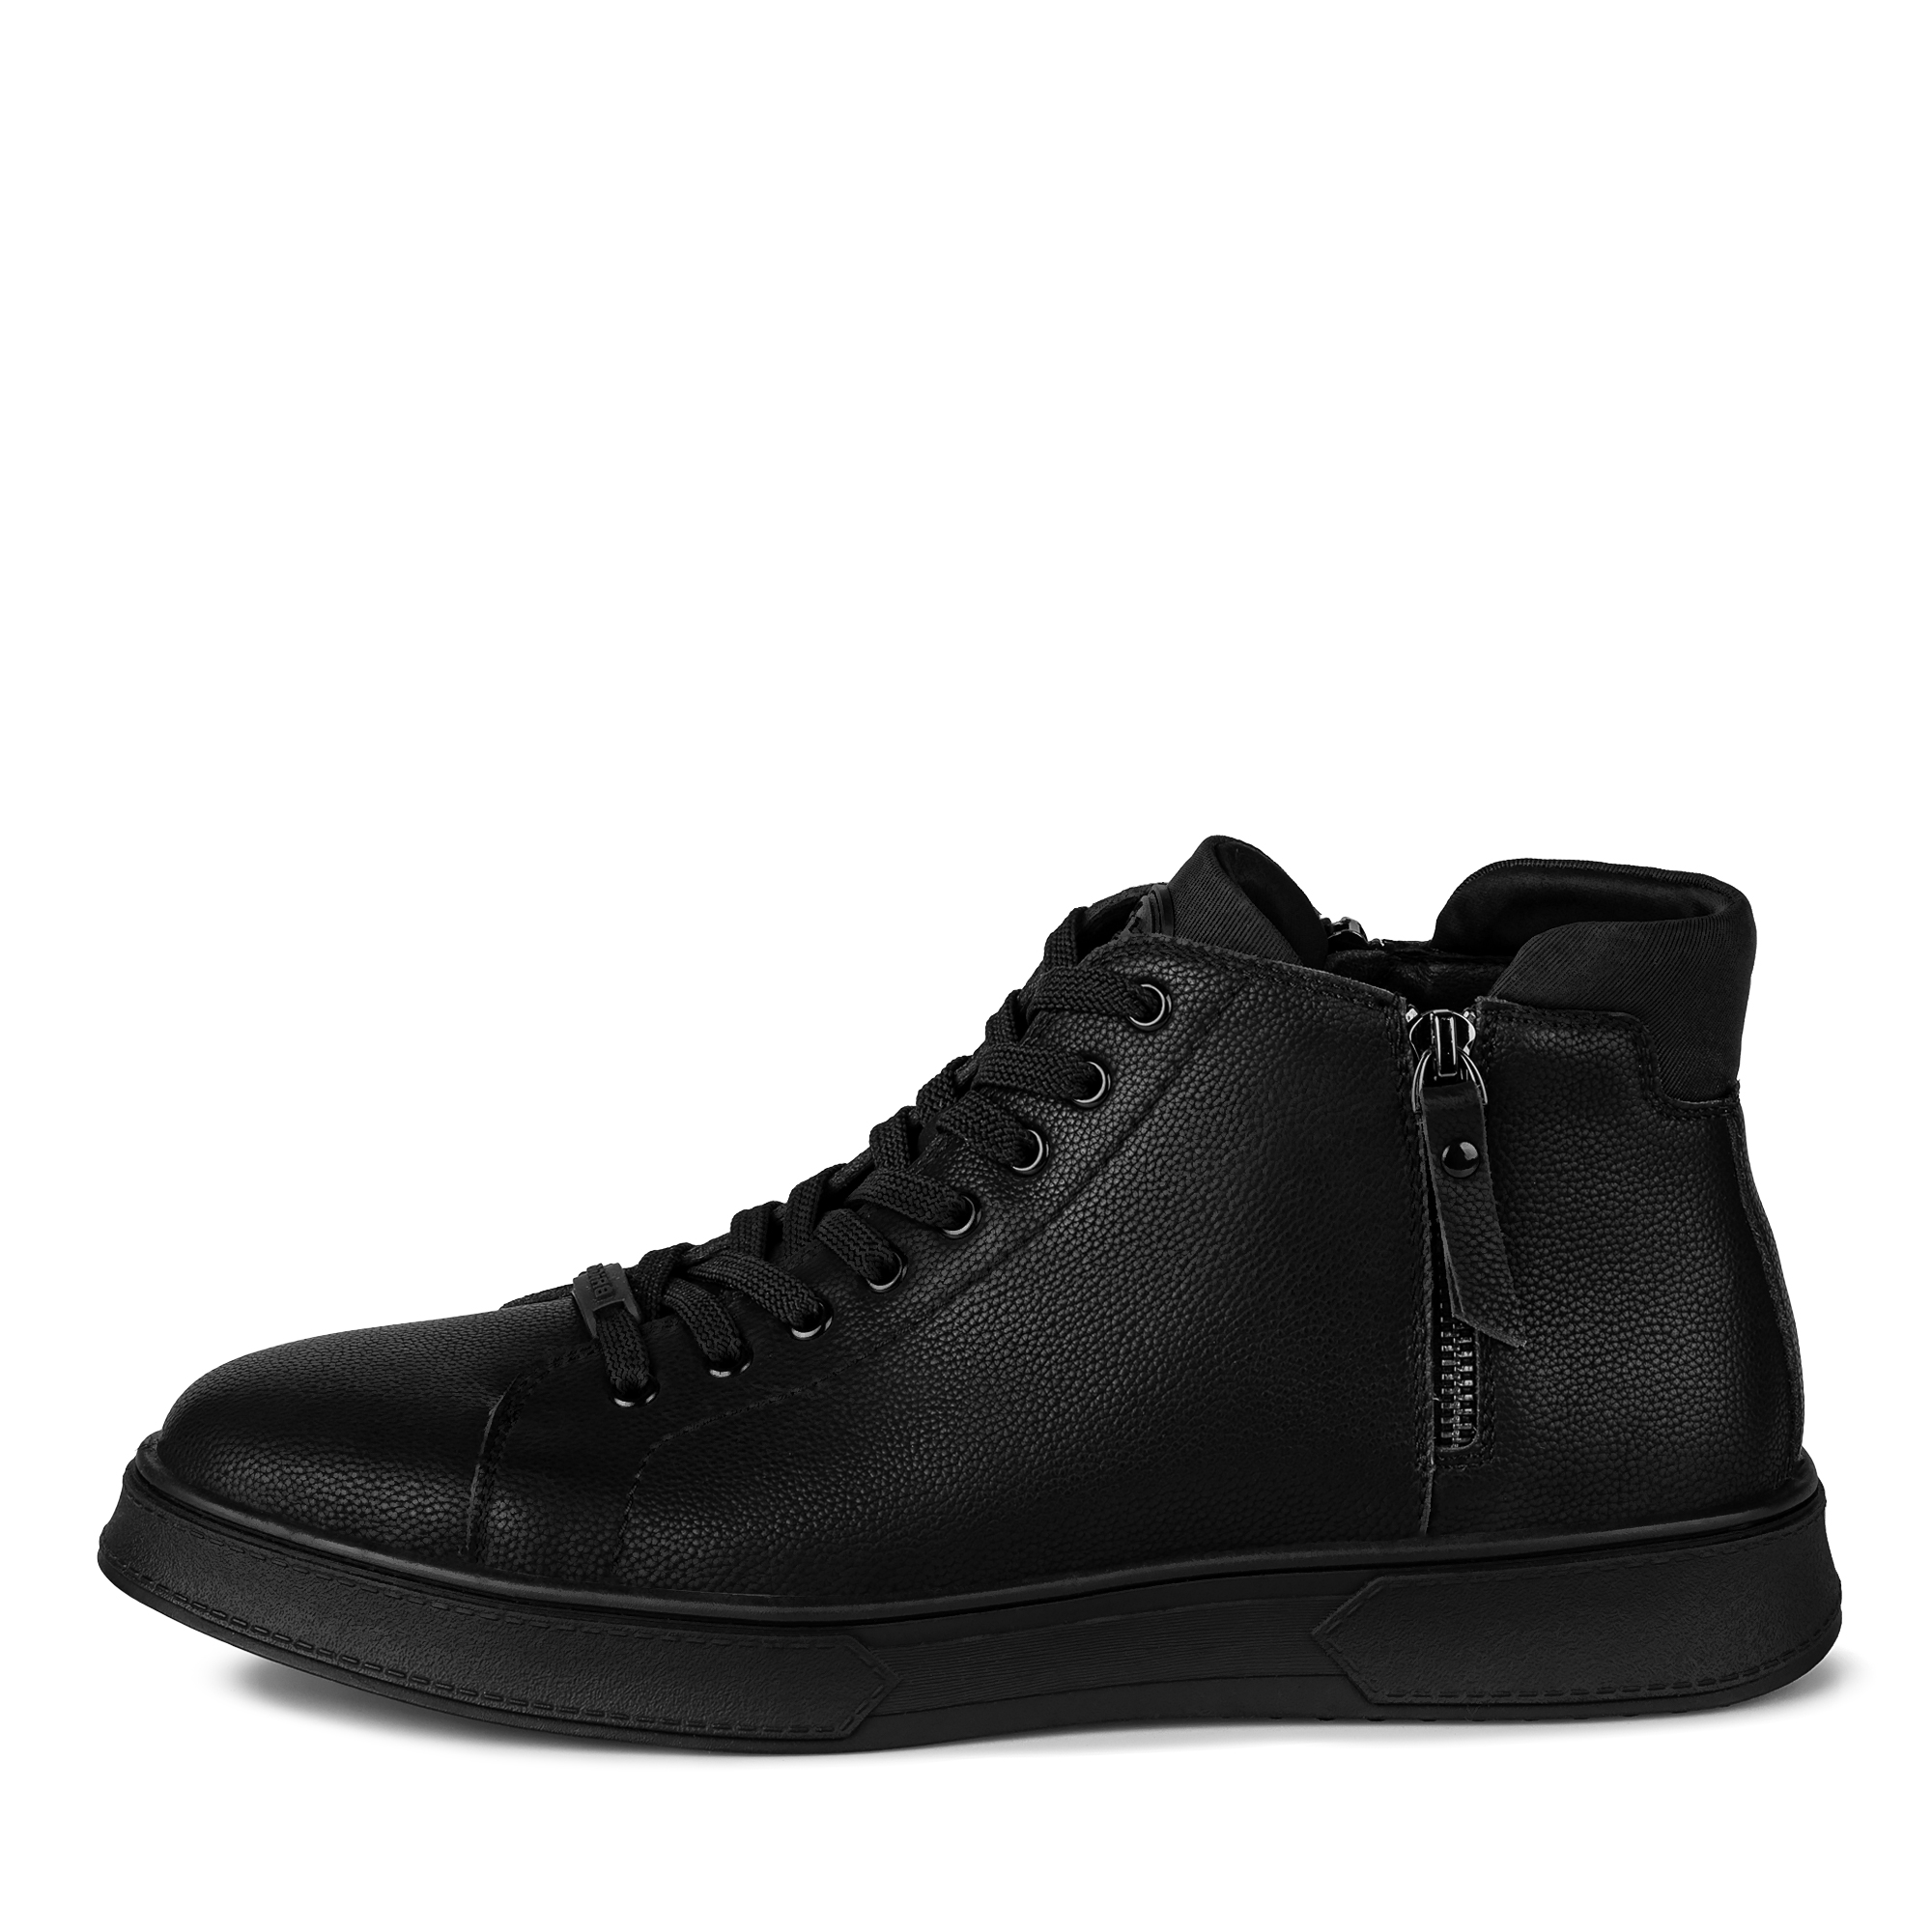 Ботинки BRIGGS 104-472A-5602